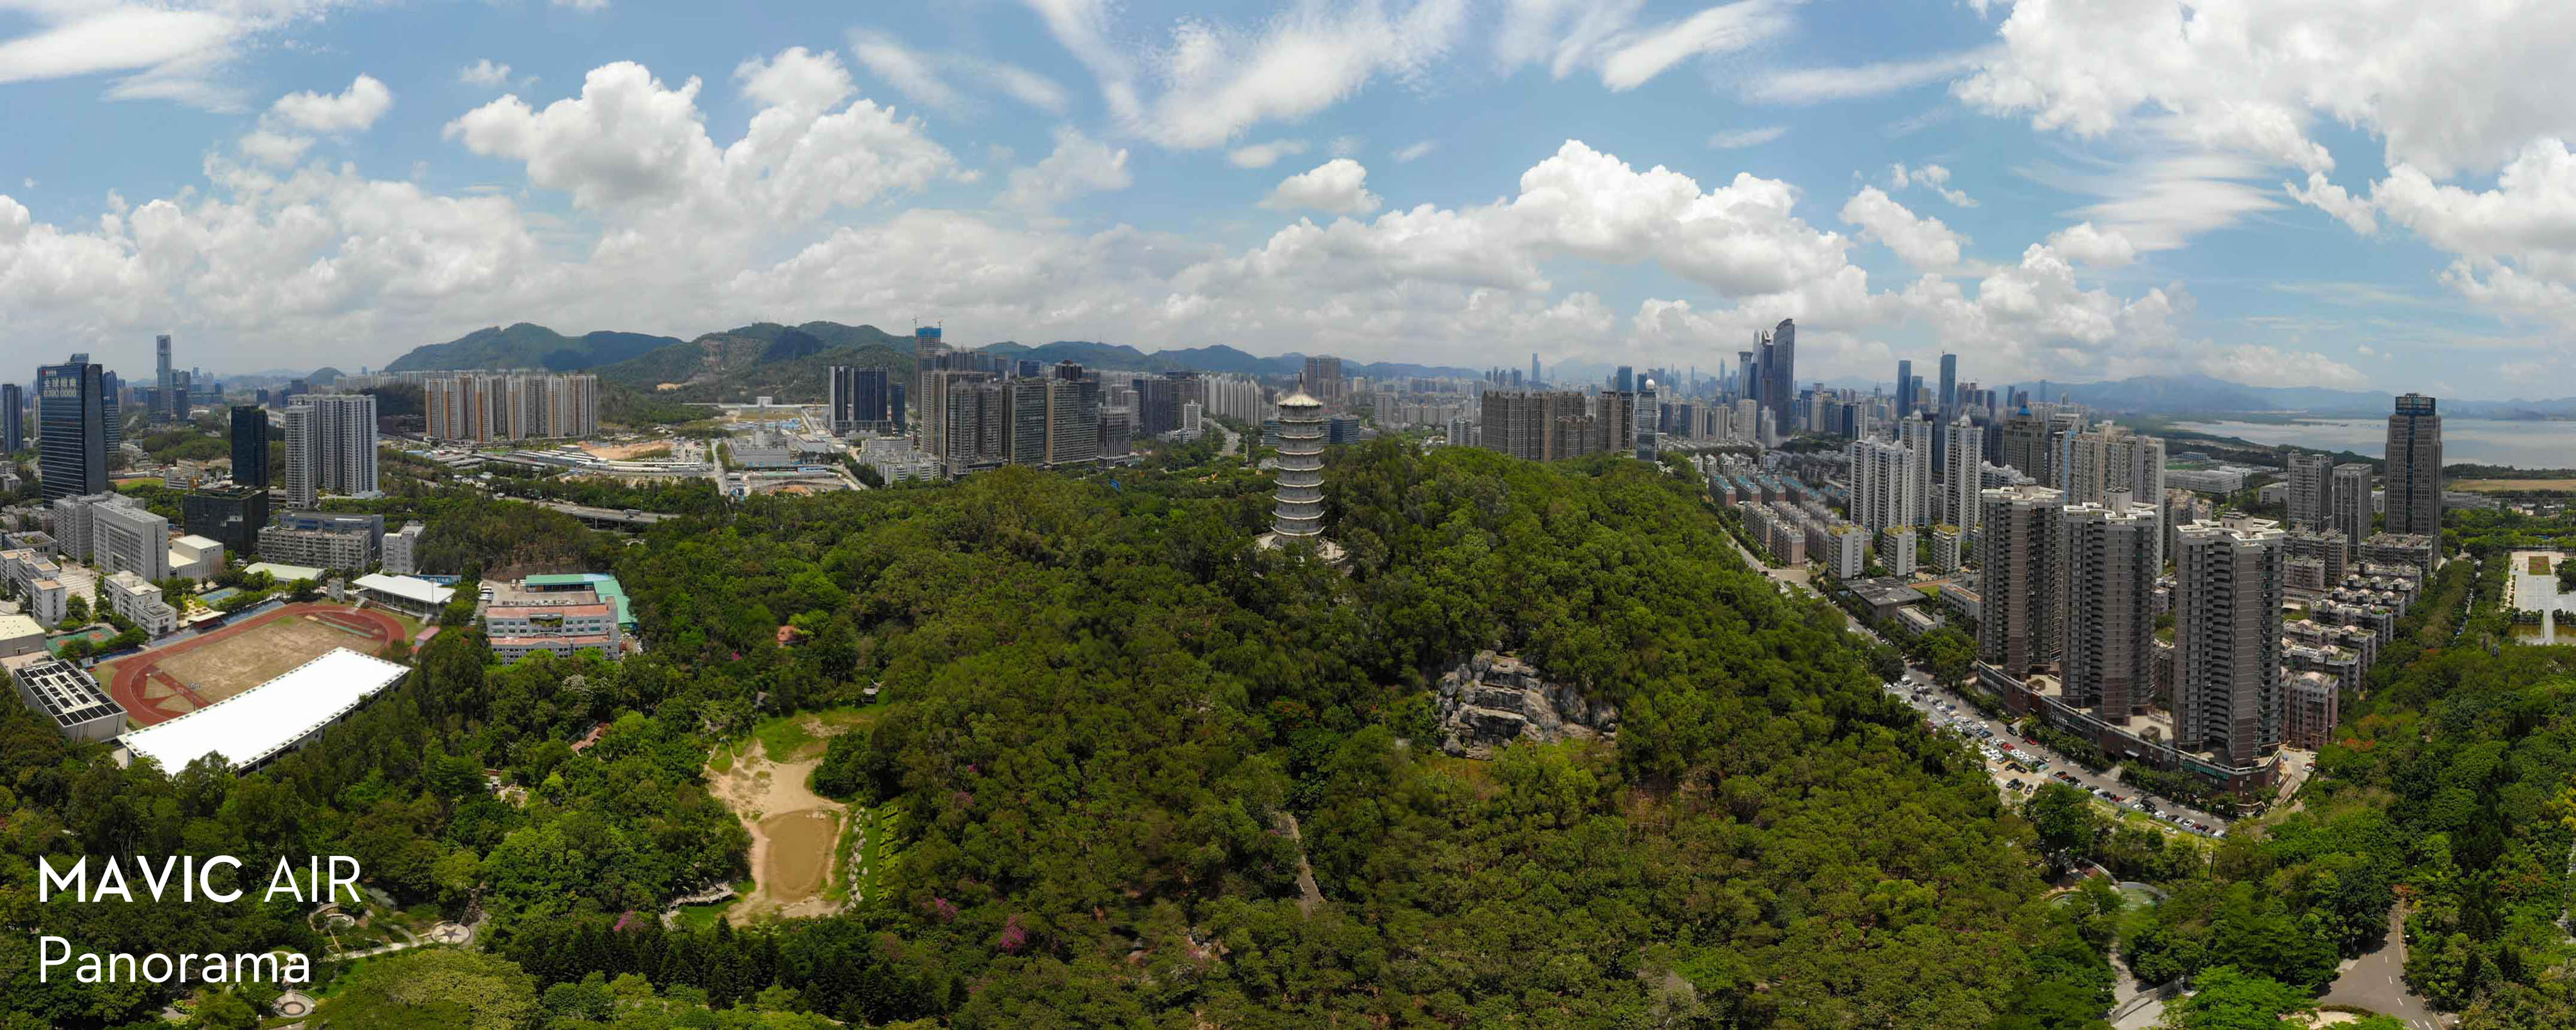 Mavic Air Panorama